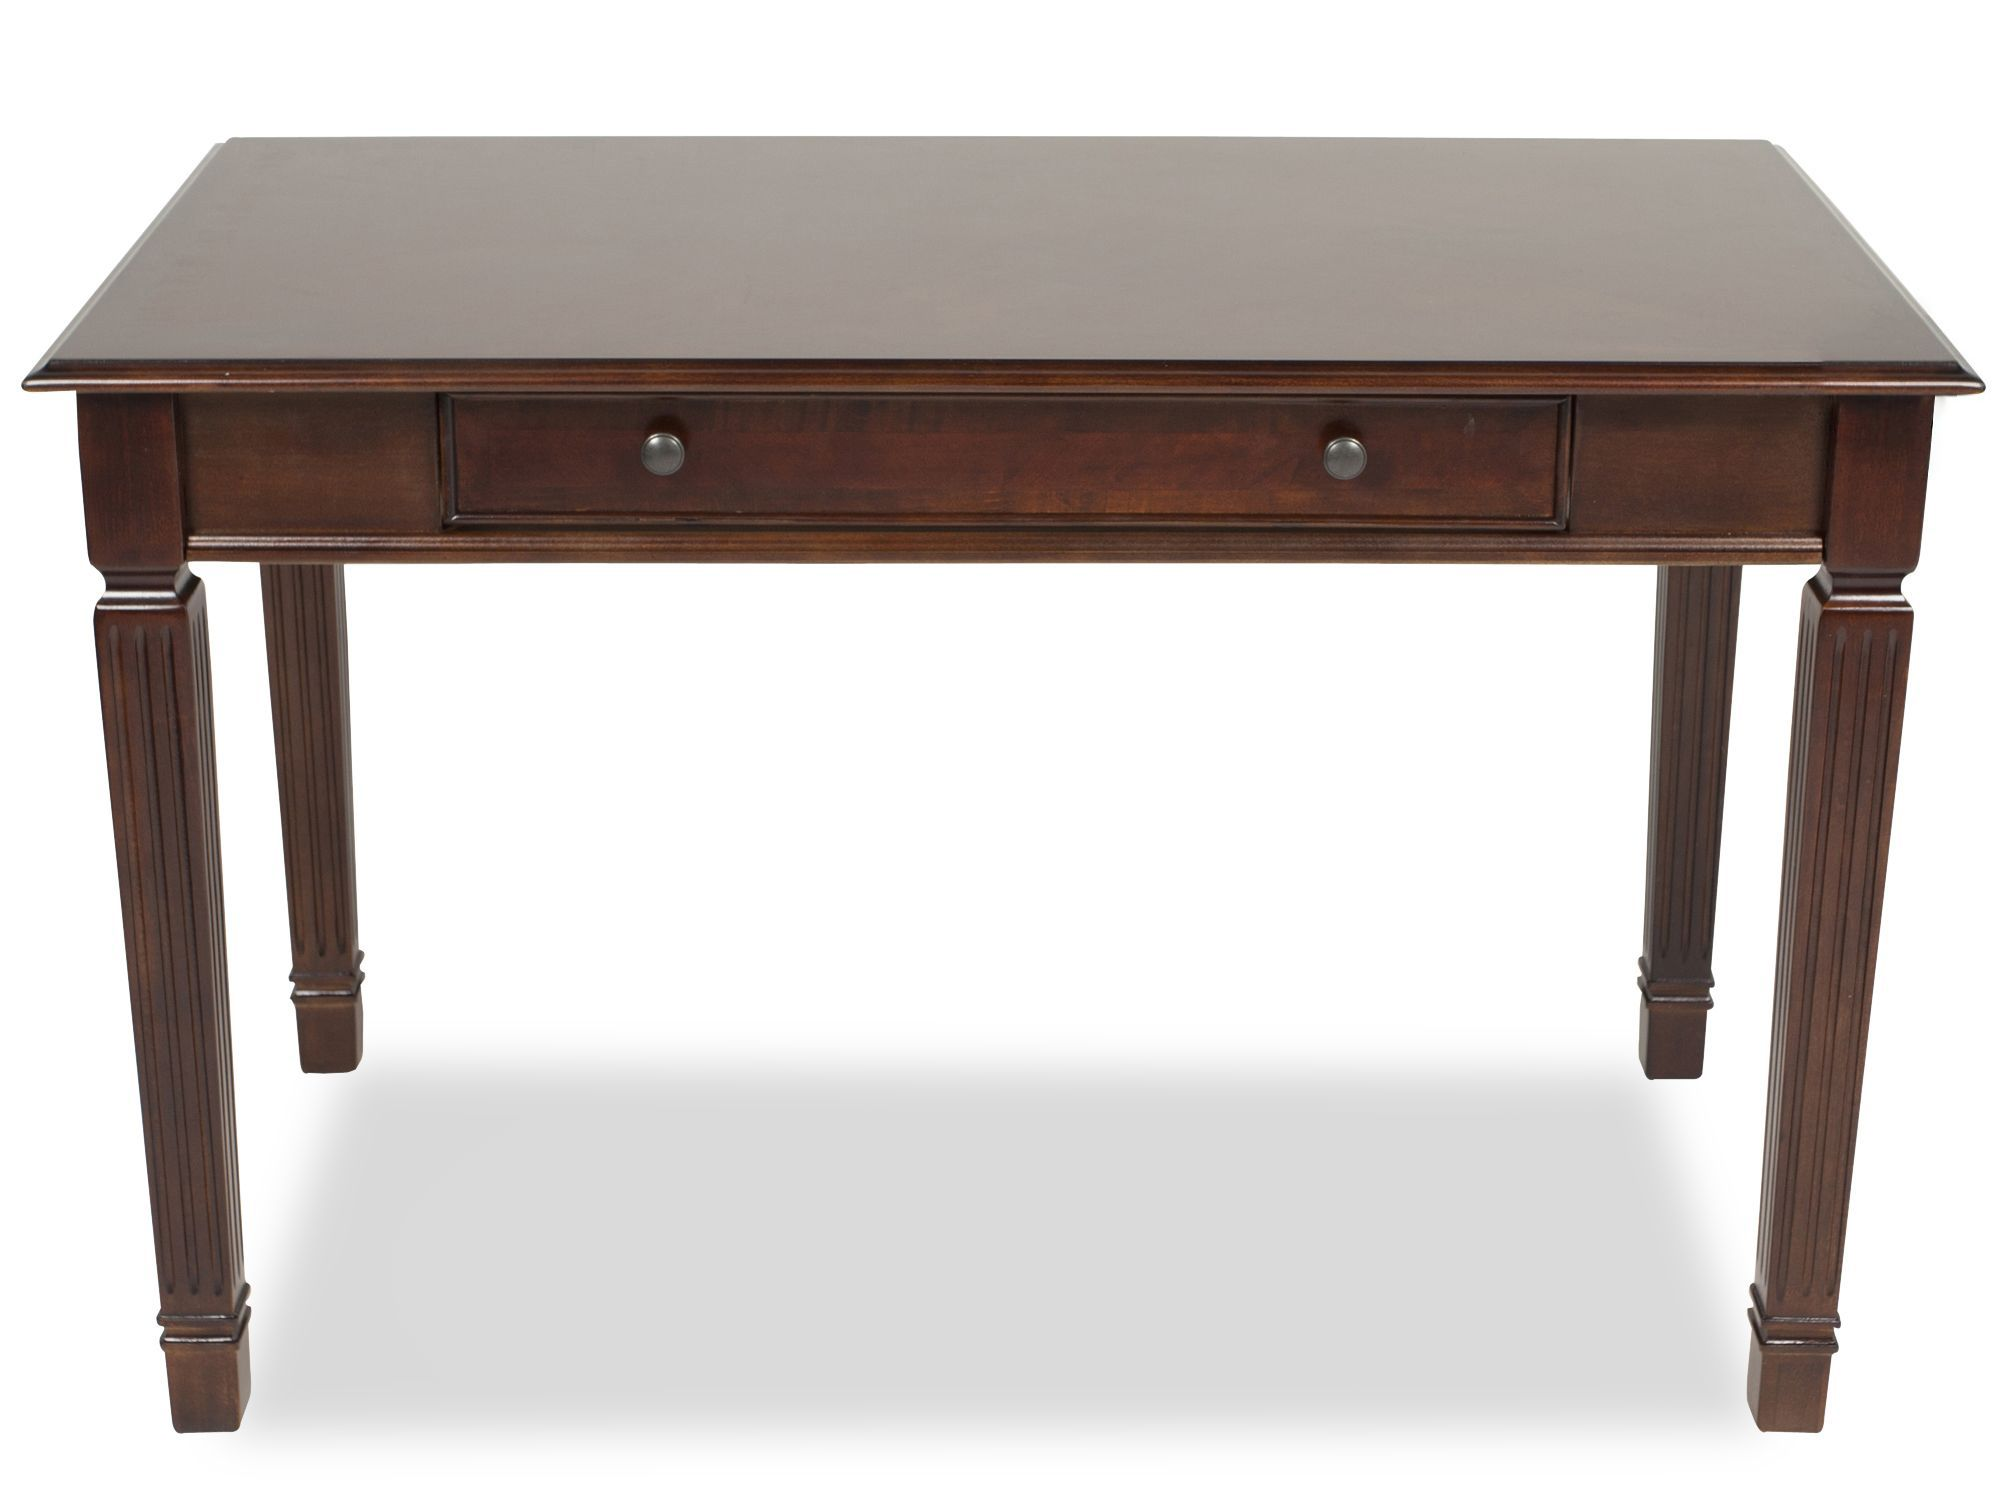 СтолПисьменные столы<br><br><br>Material: Дерево<br>Width см: 121<br>Depth см: 68<br>Height см: 76